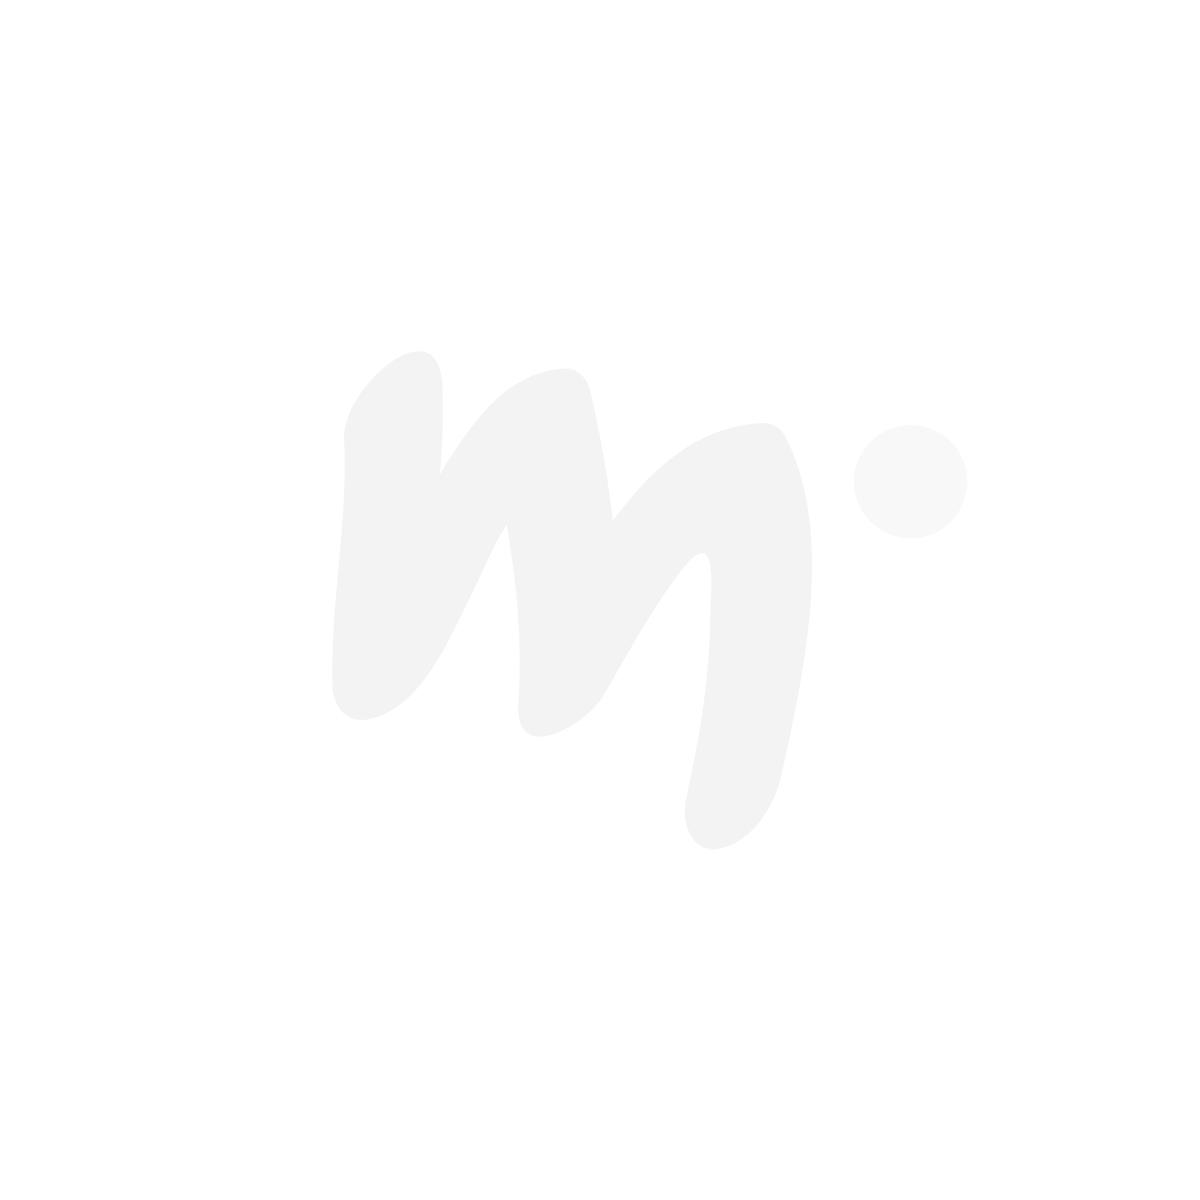 Mx Deco Glittertonttu 30 cm vaaleanpunainen